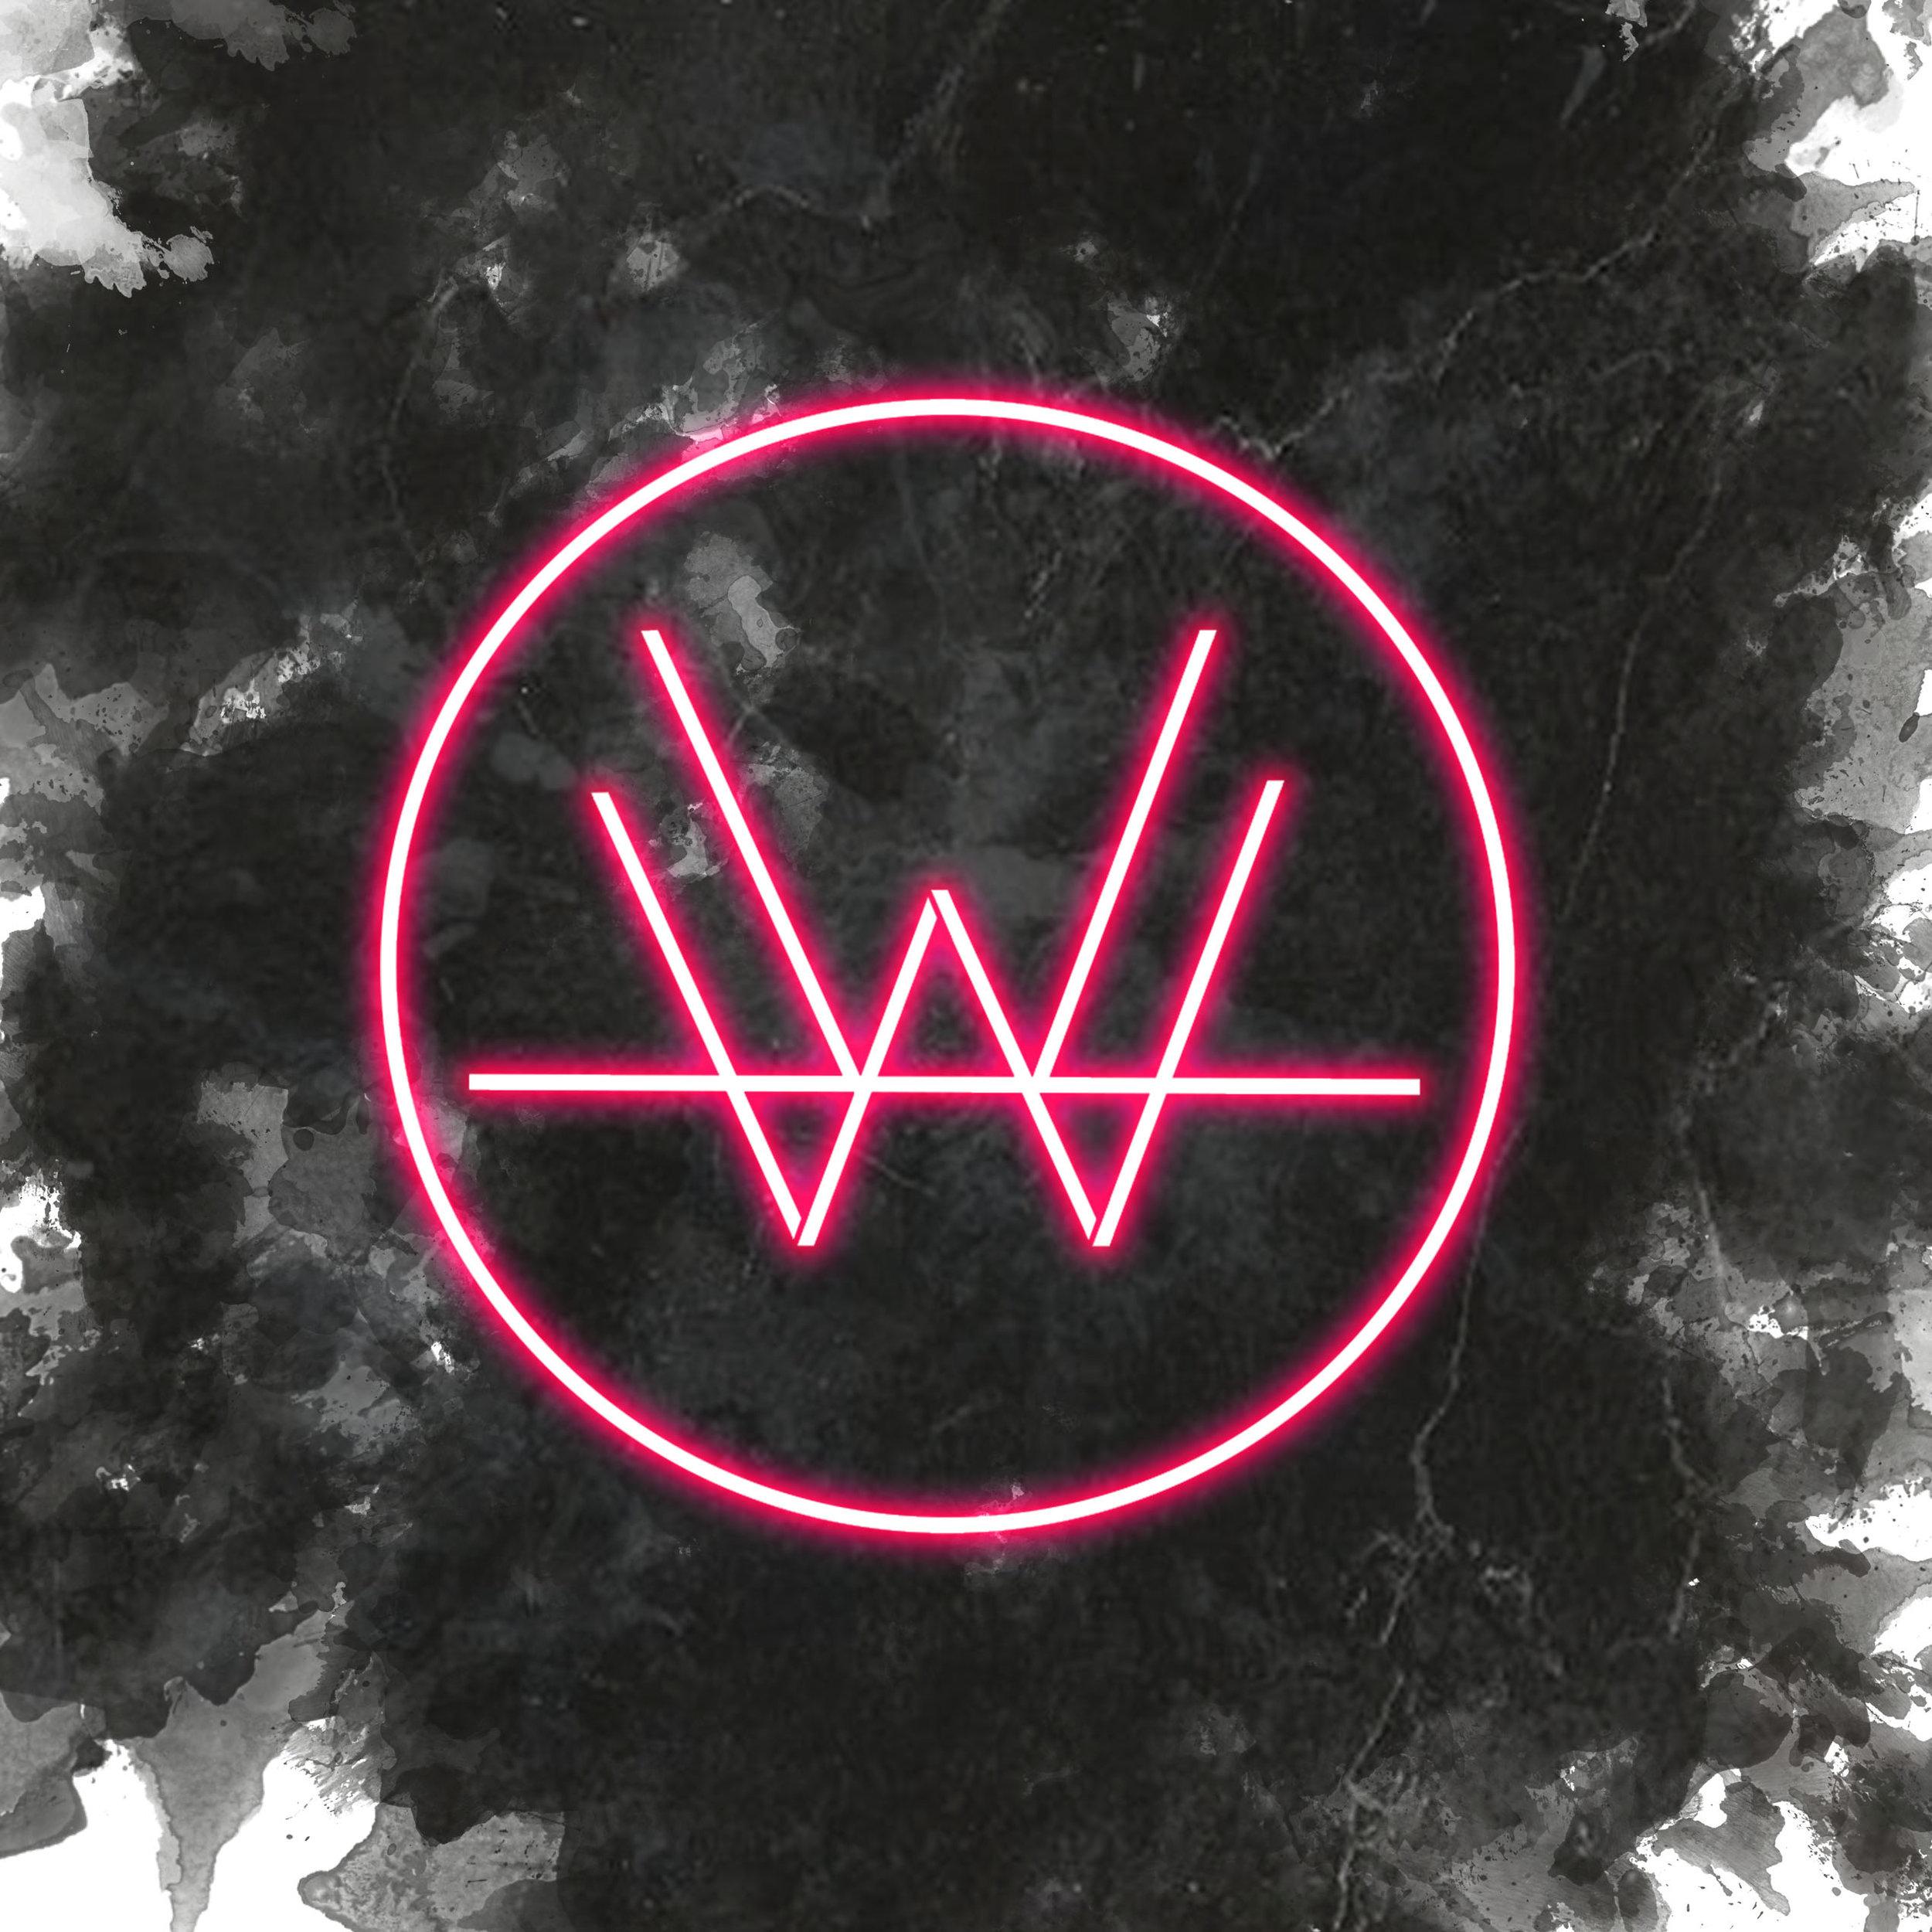 waw_glow.jpg